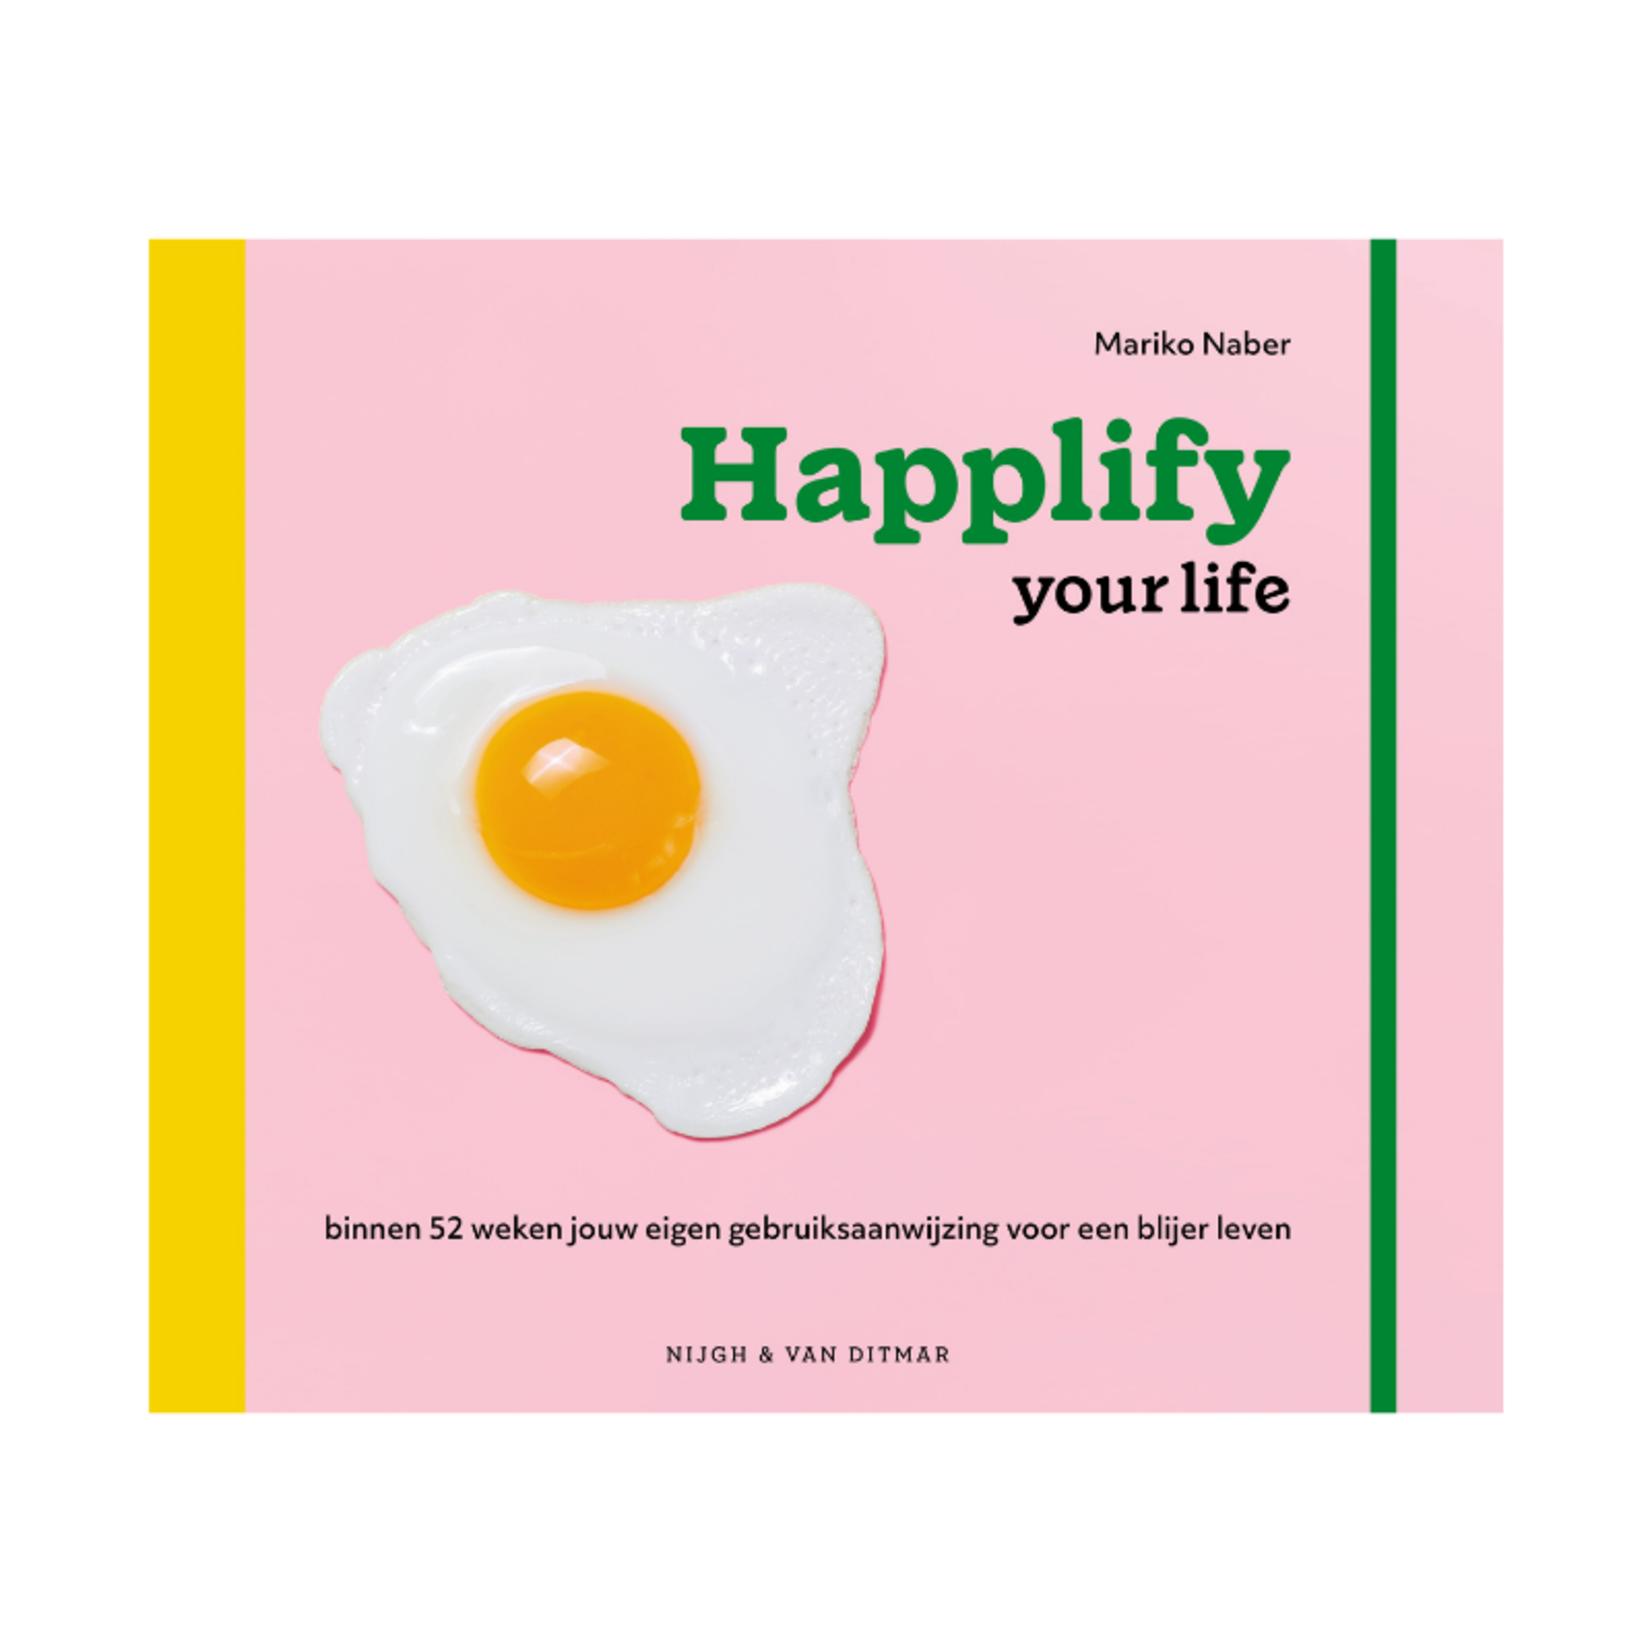 happlify your life - mariko naber